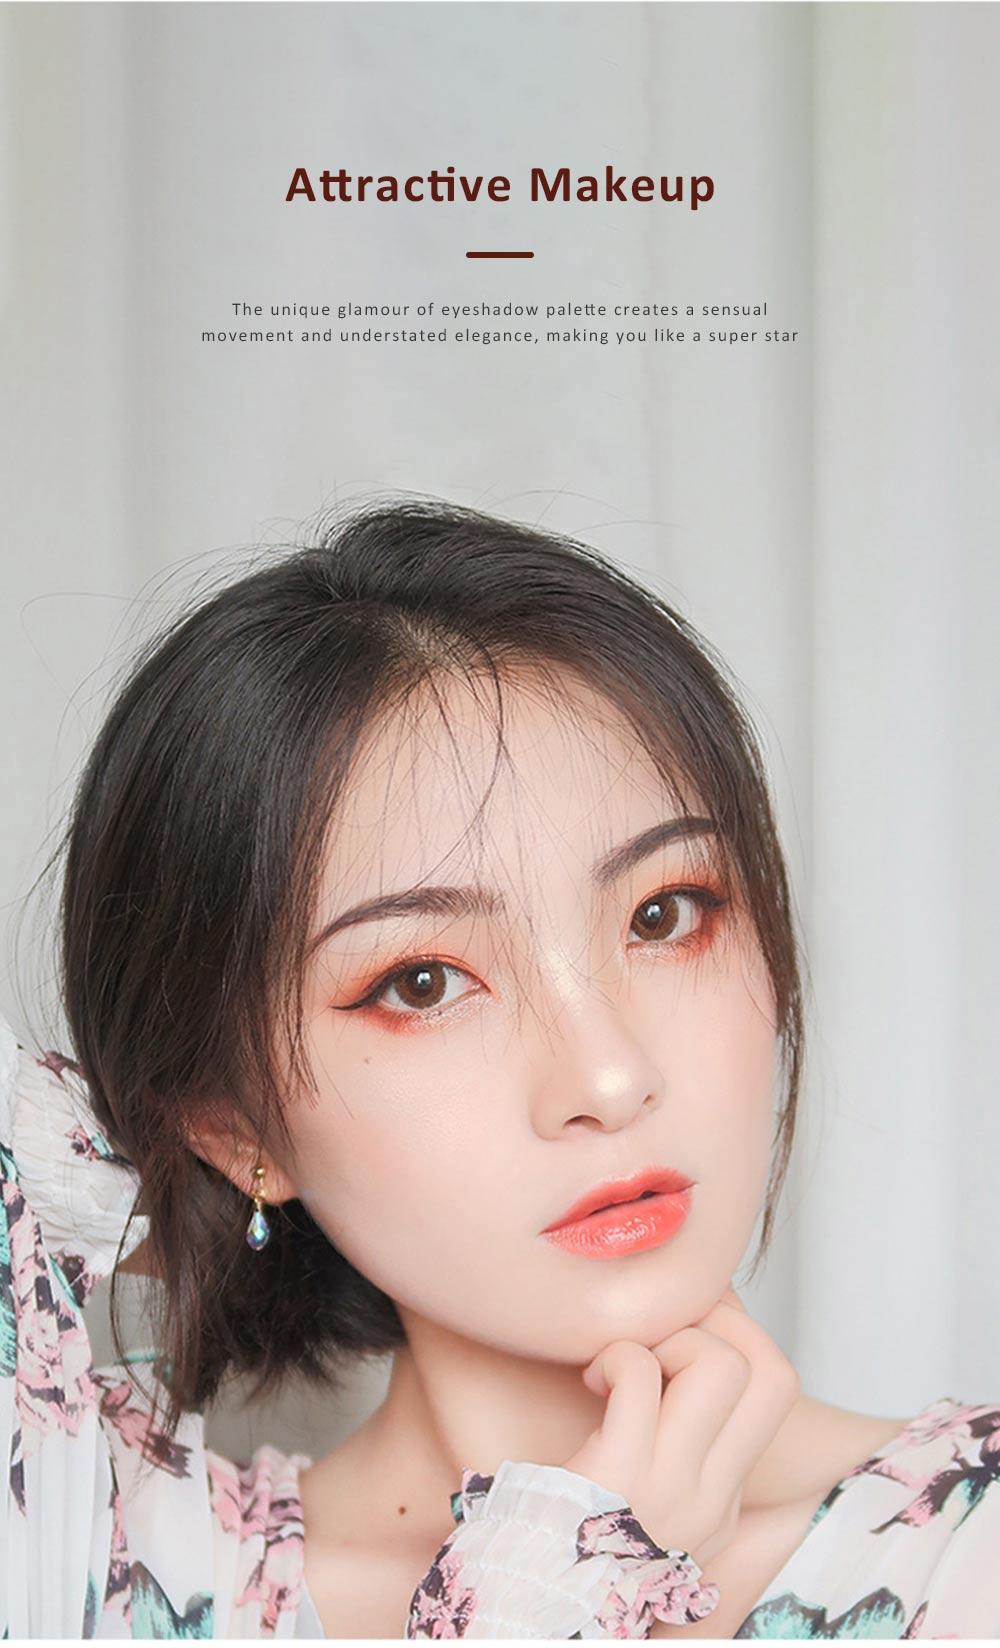 Compact Eyeshadow Palette Matte Waterproof 5 Colors Eye Makeup Natural Smoky Eye Shadow Cosmetic 5